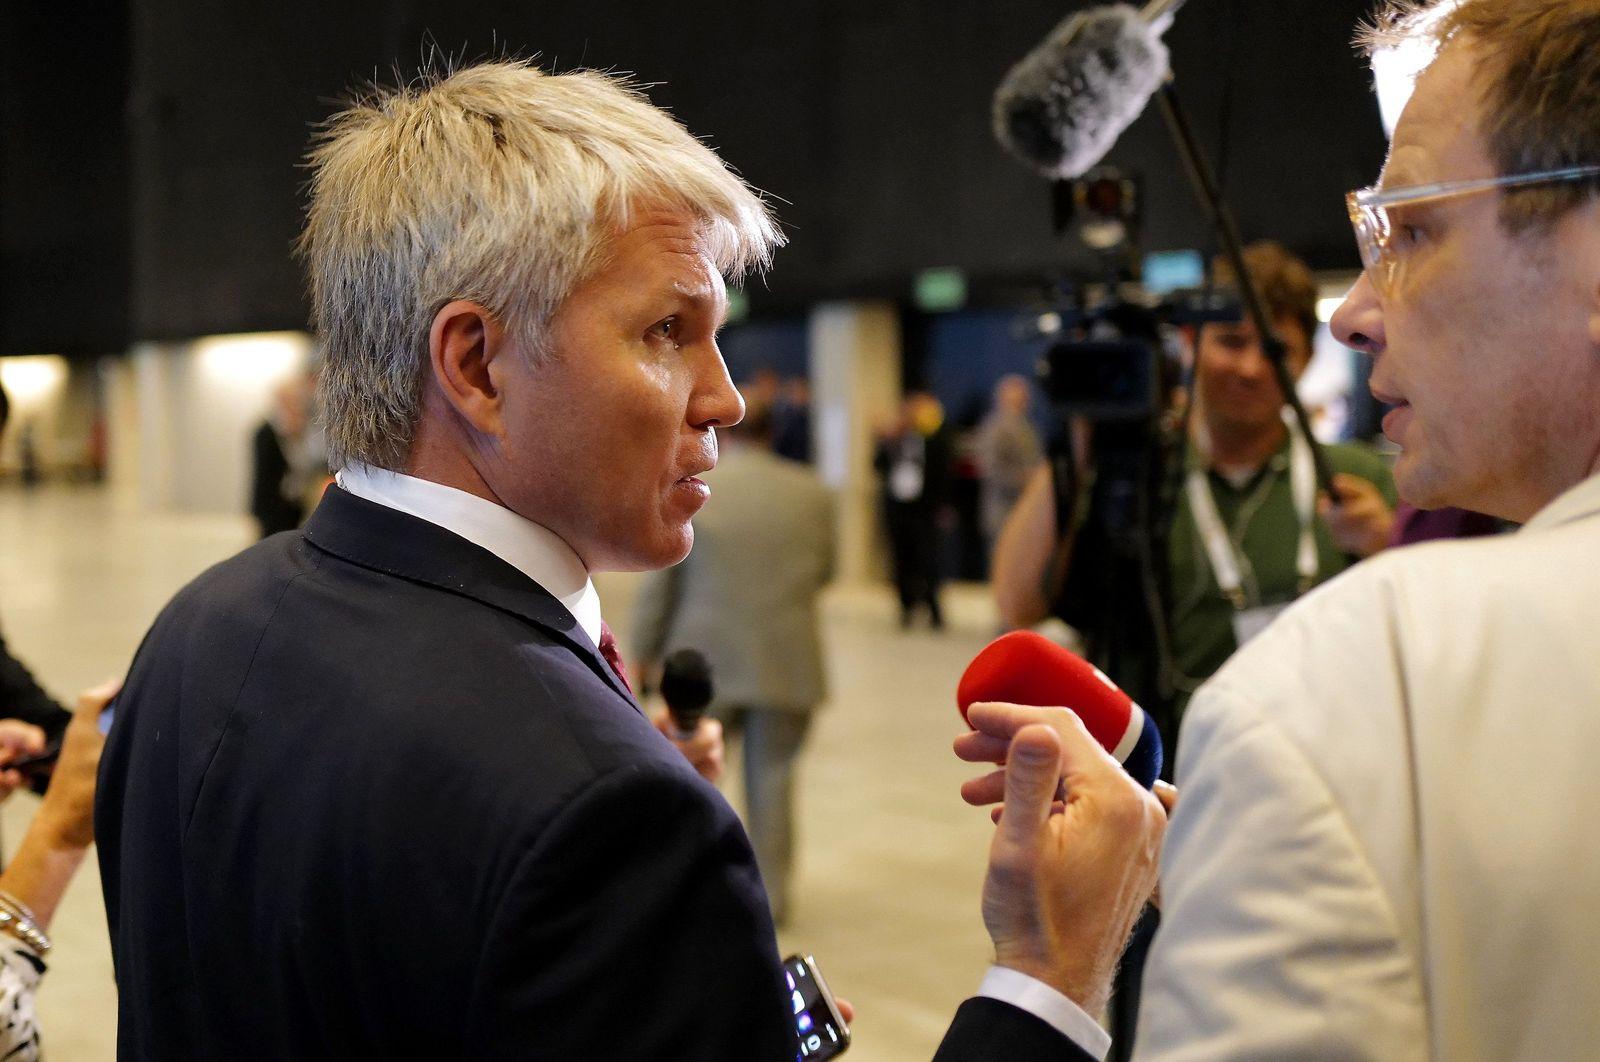 5. Welt-Anti-Doping-Konferenz